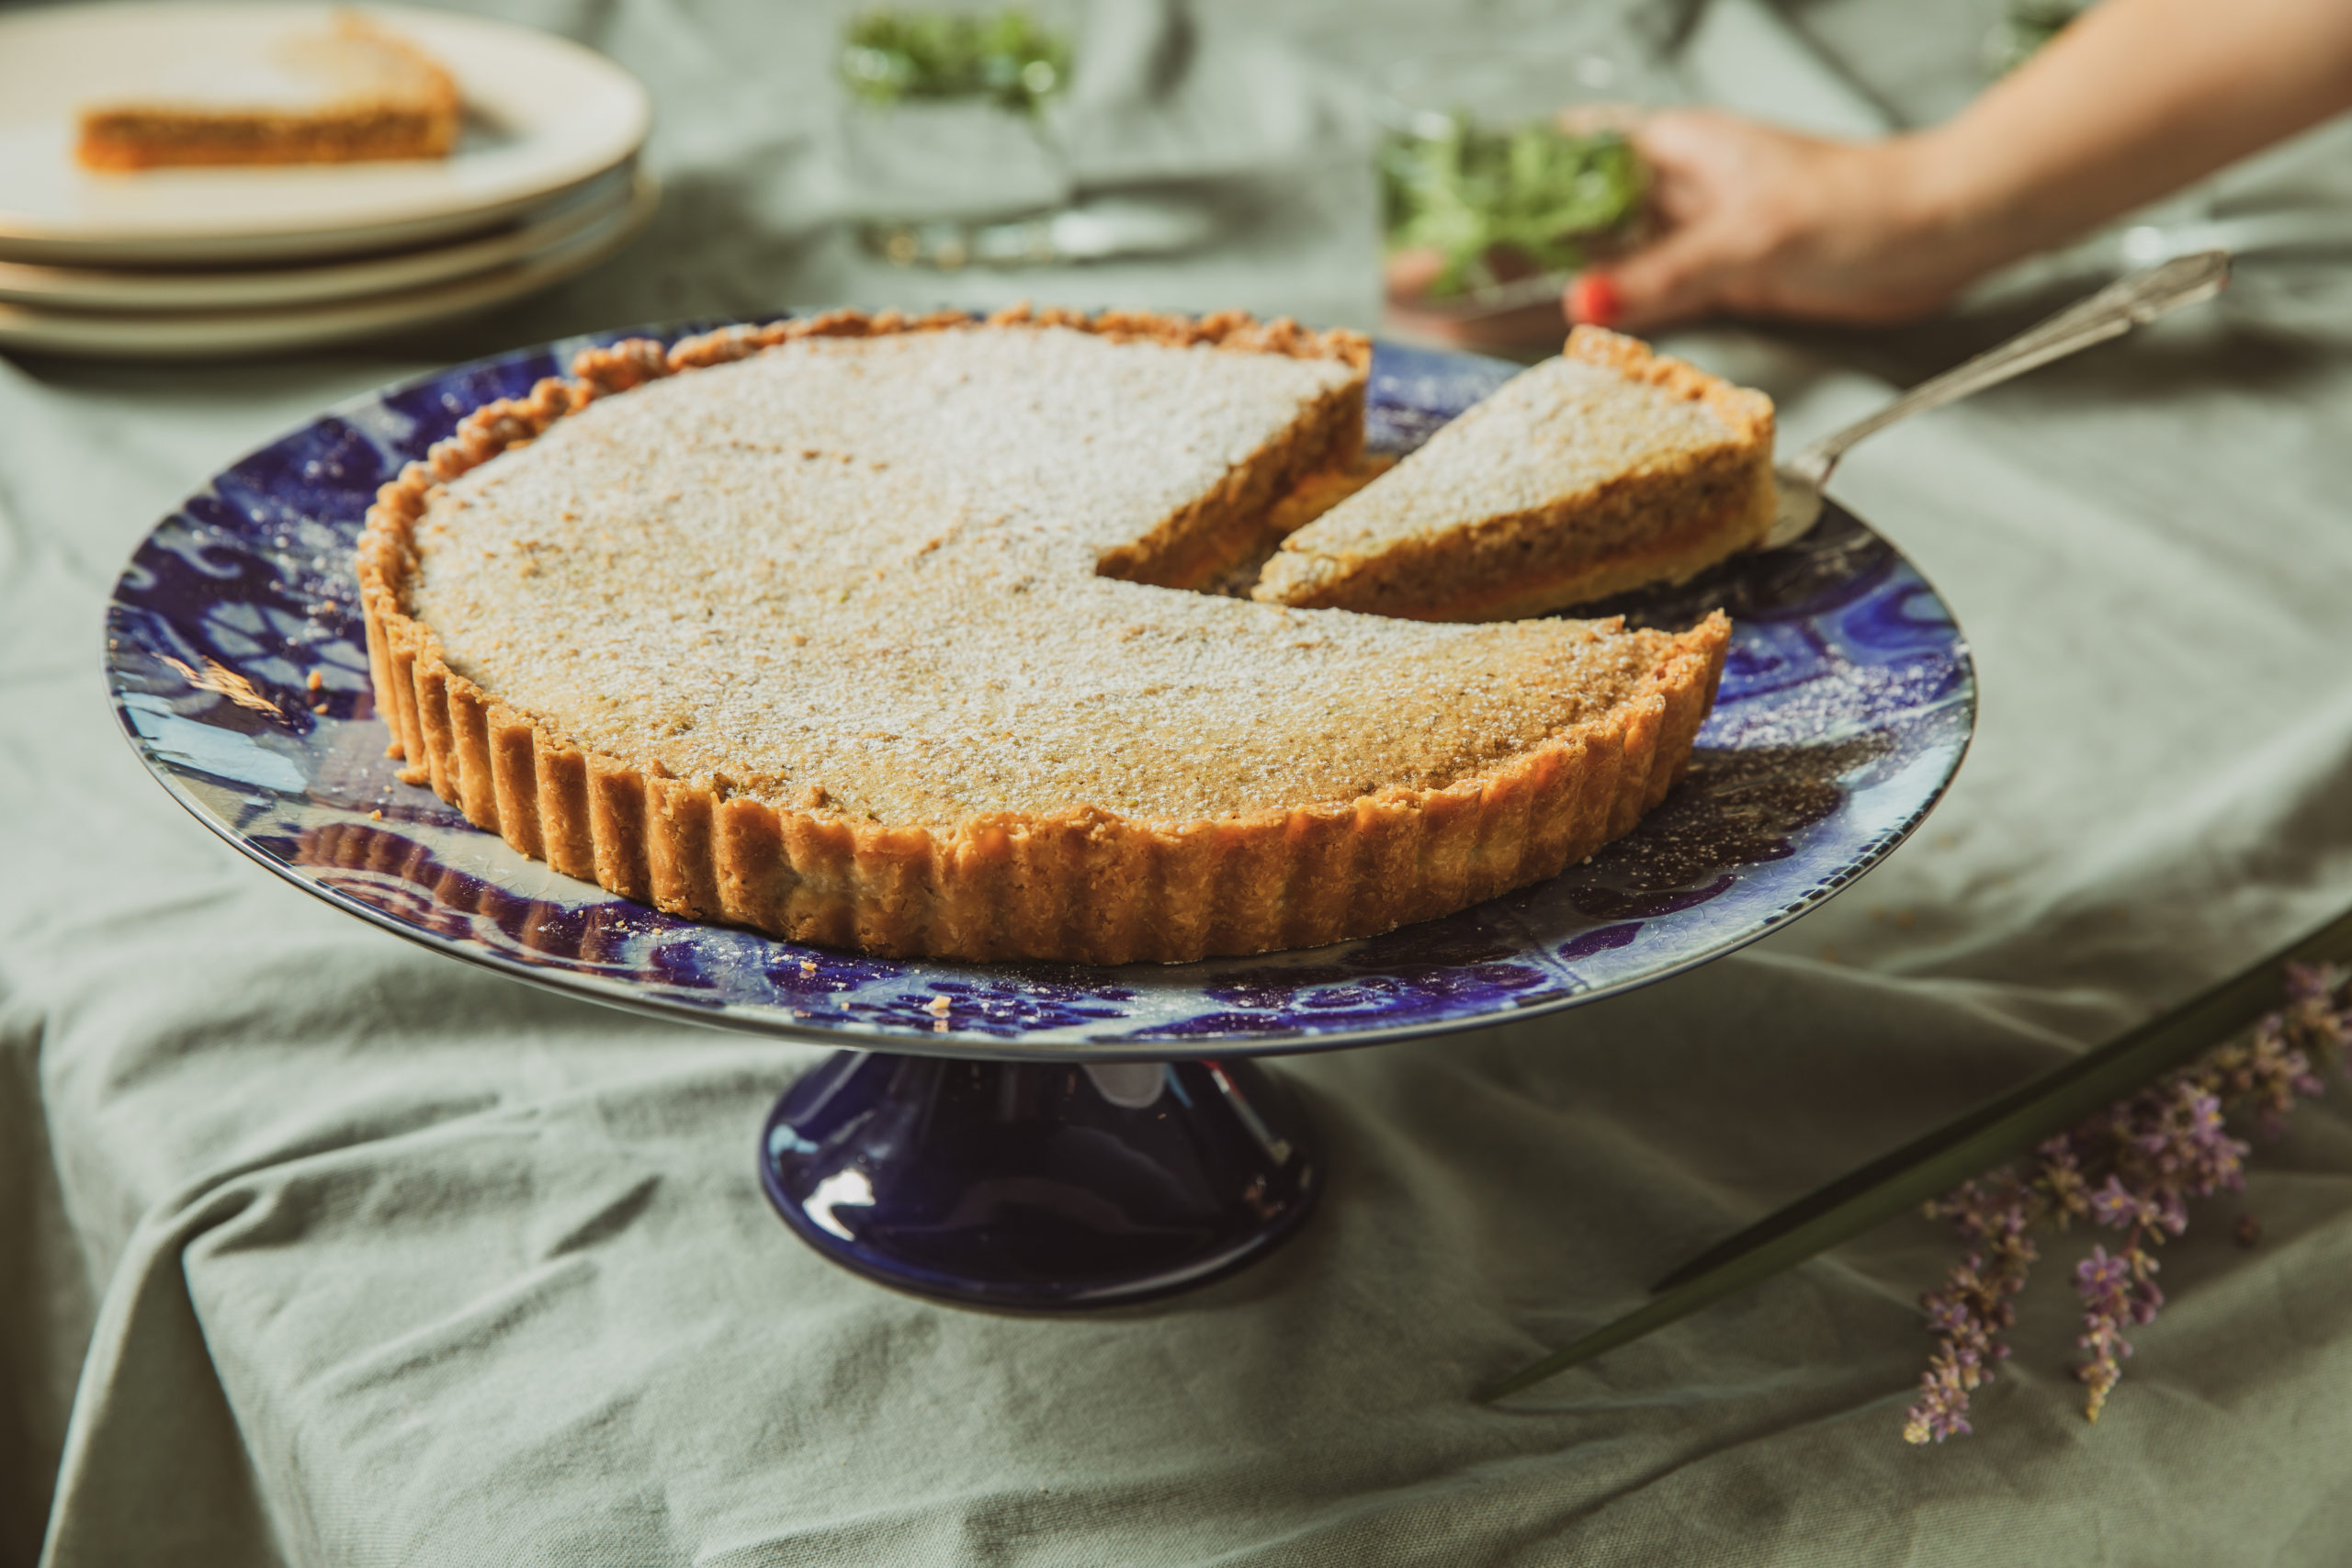 A Rosh Hashanah pumpkin jam tart on a blue and white serving plate